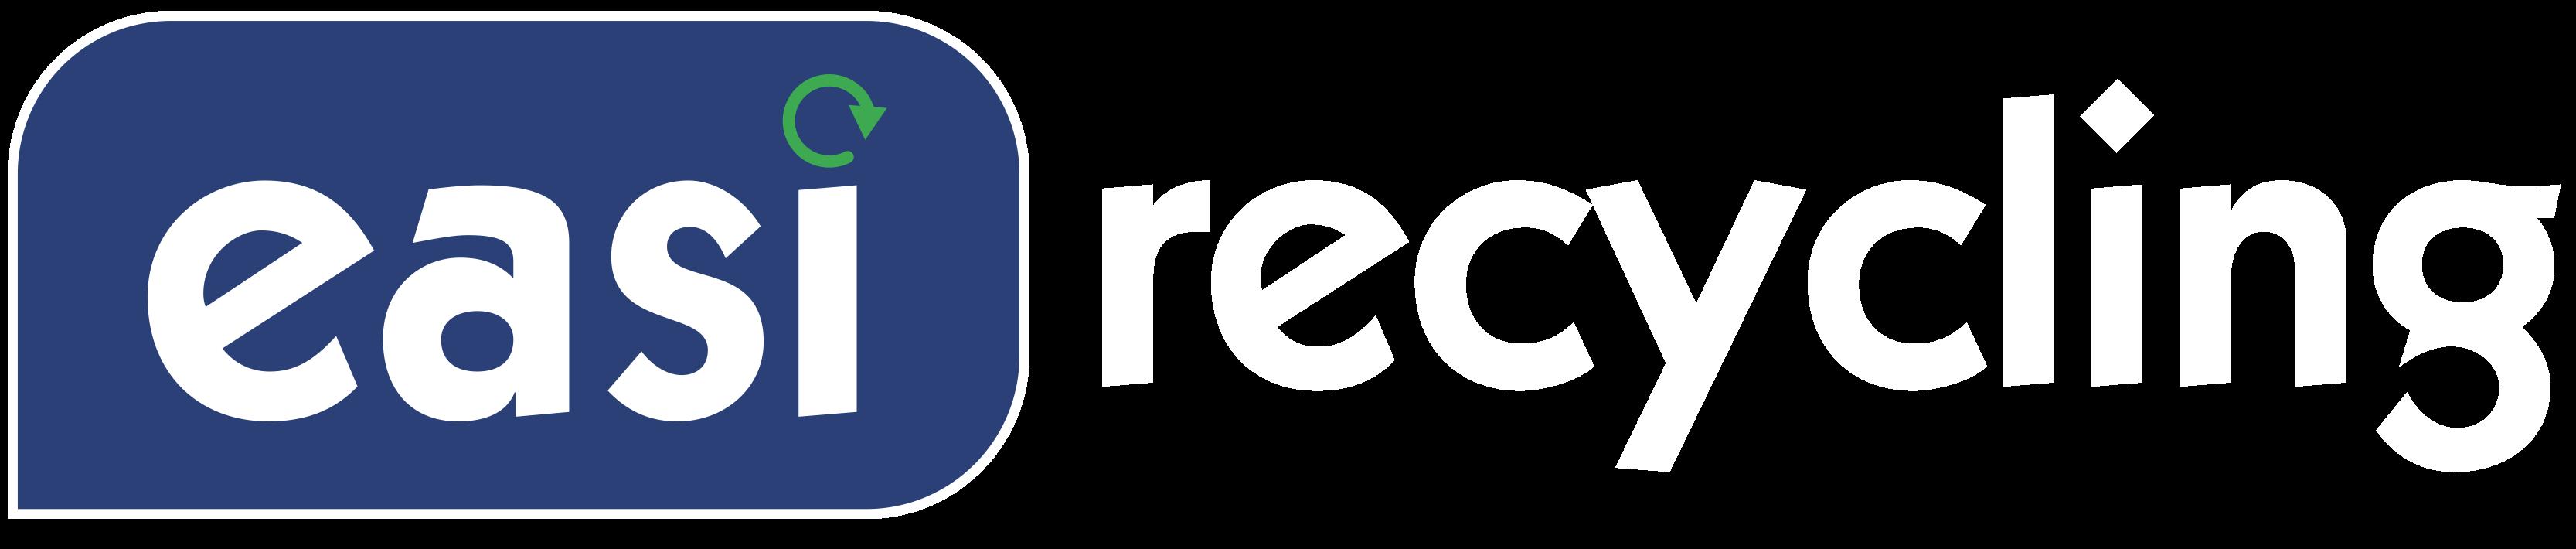 Easi Recycling Australia